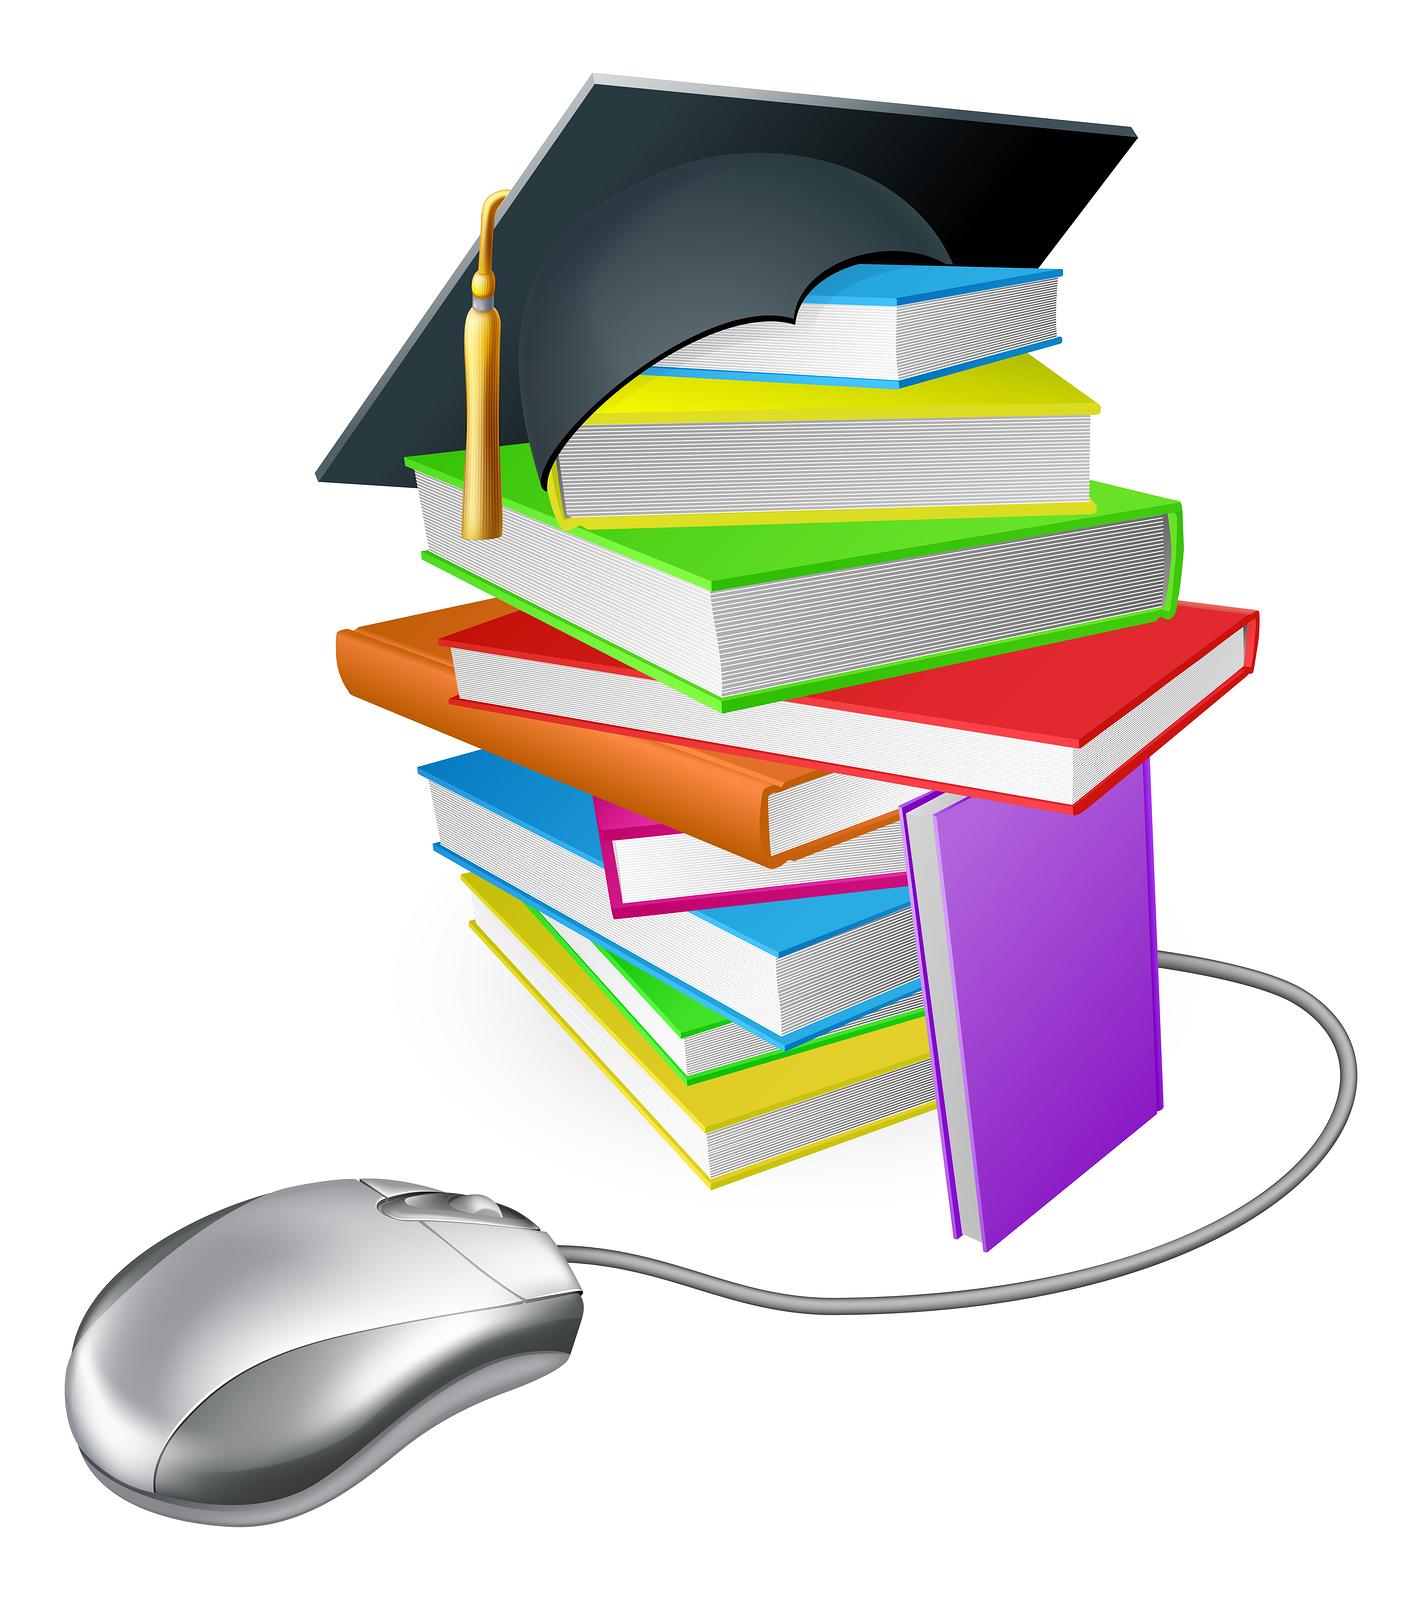 bigstock-Internet-Learning-Concept-40837813.jpg